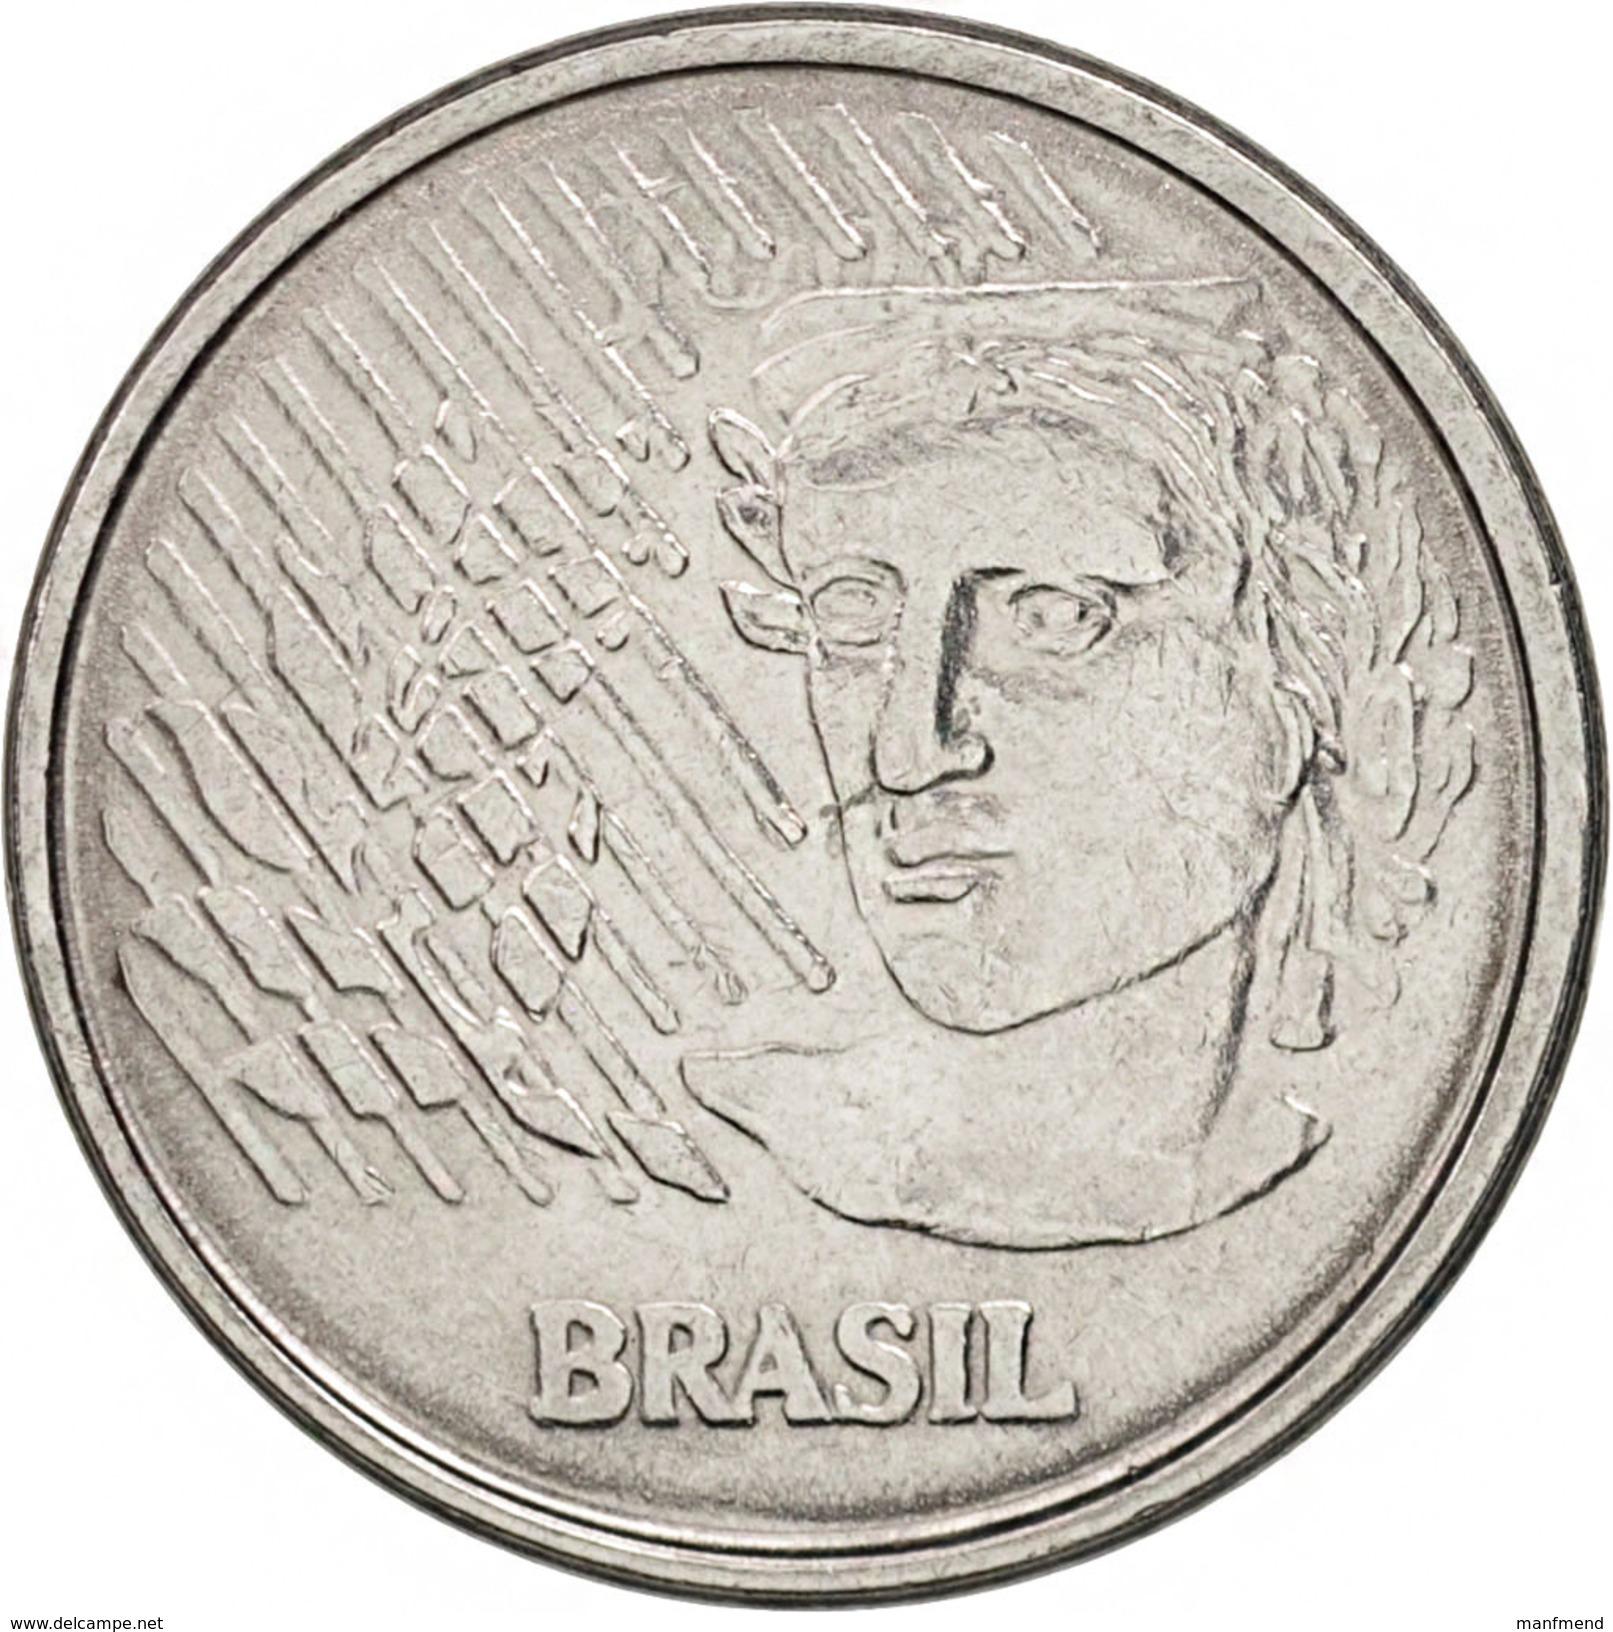 Brazil - 1994 - 10 Centavos - KM 633 - XF - Brasilien